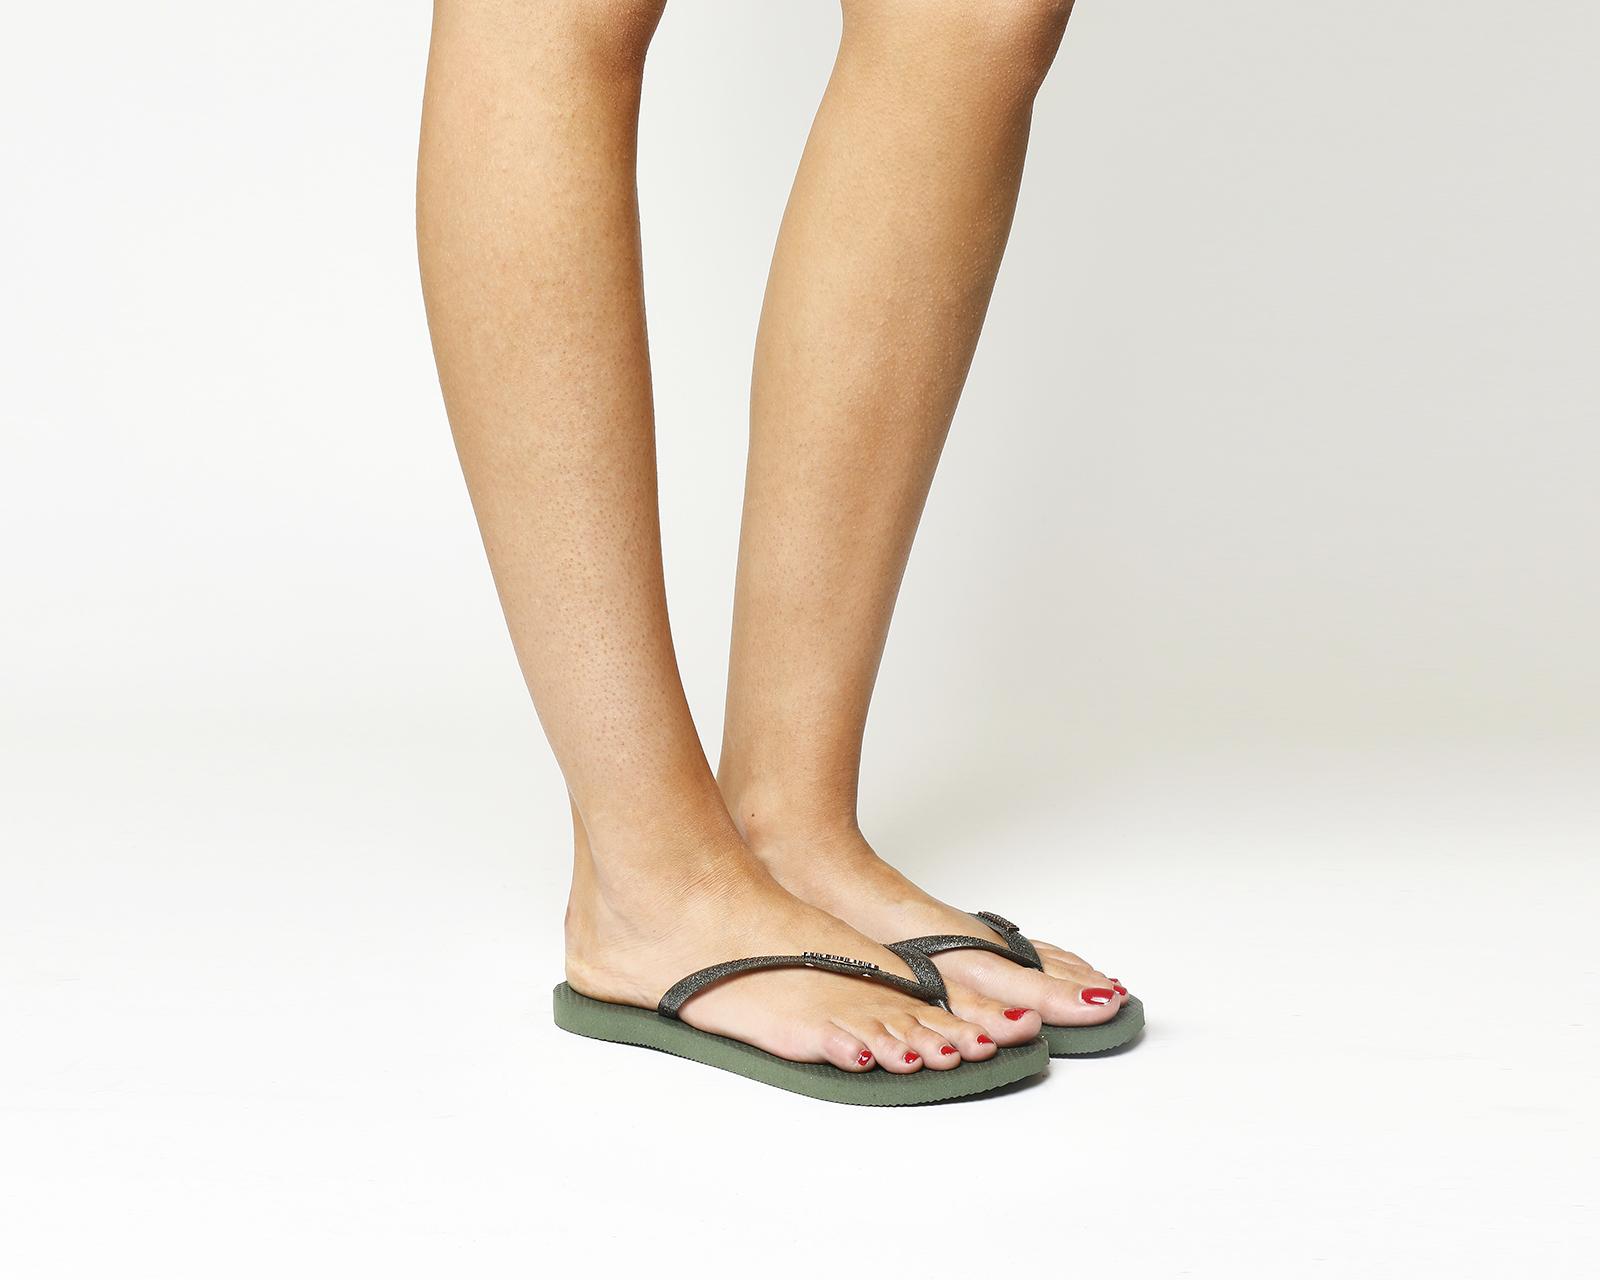 30e05329e Sentinel Womens Havaianas Slim Logo Metallic Flip Flops GREEN OLIVE Sandals